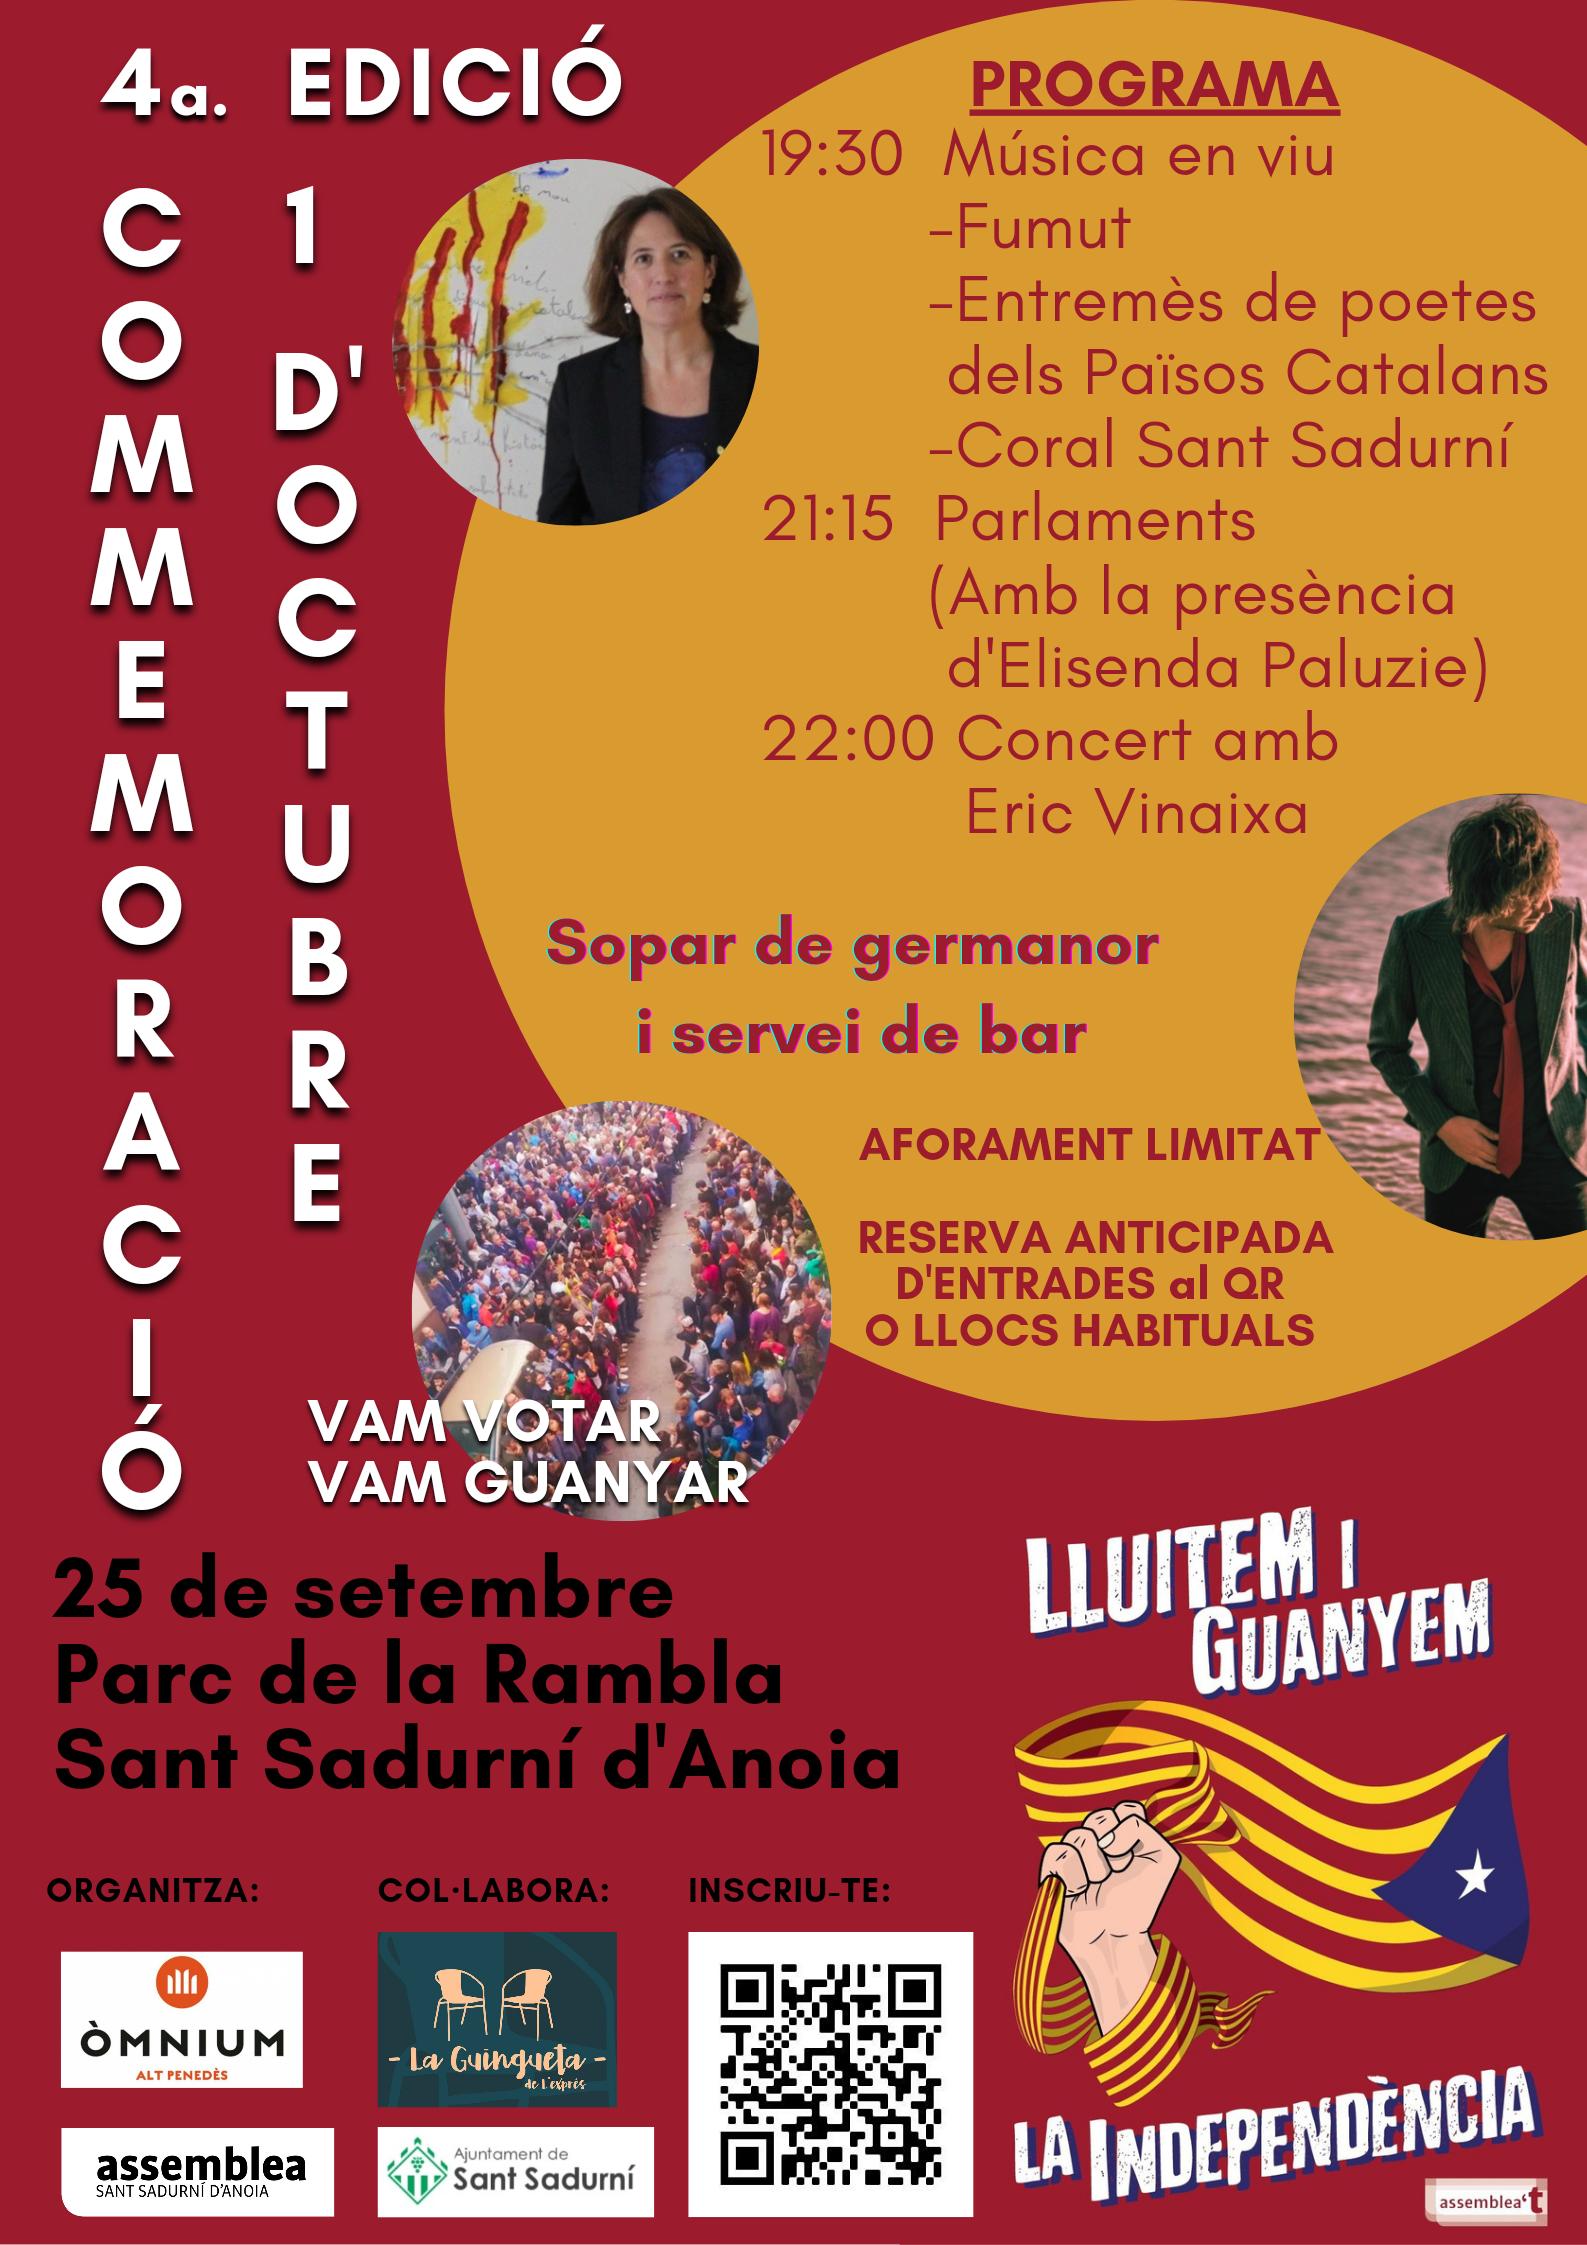 Commemoració de l'1-O a Sant Sadurní d'Anoia